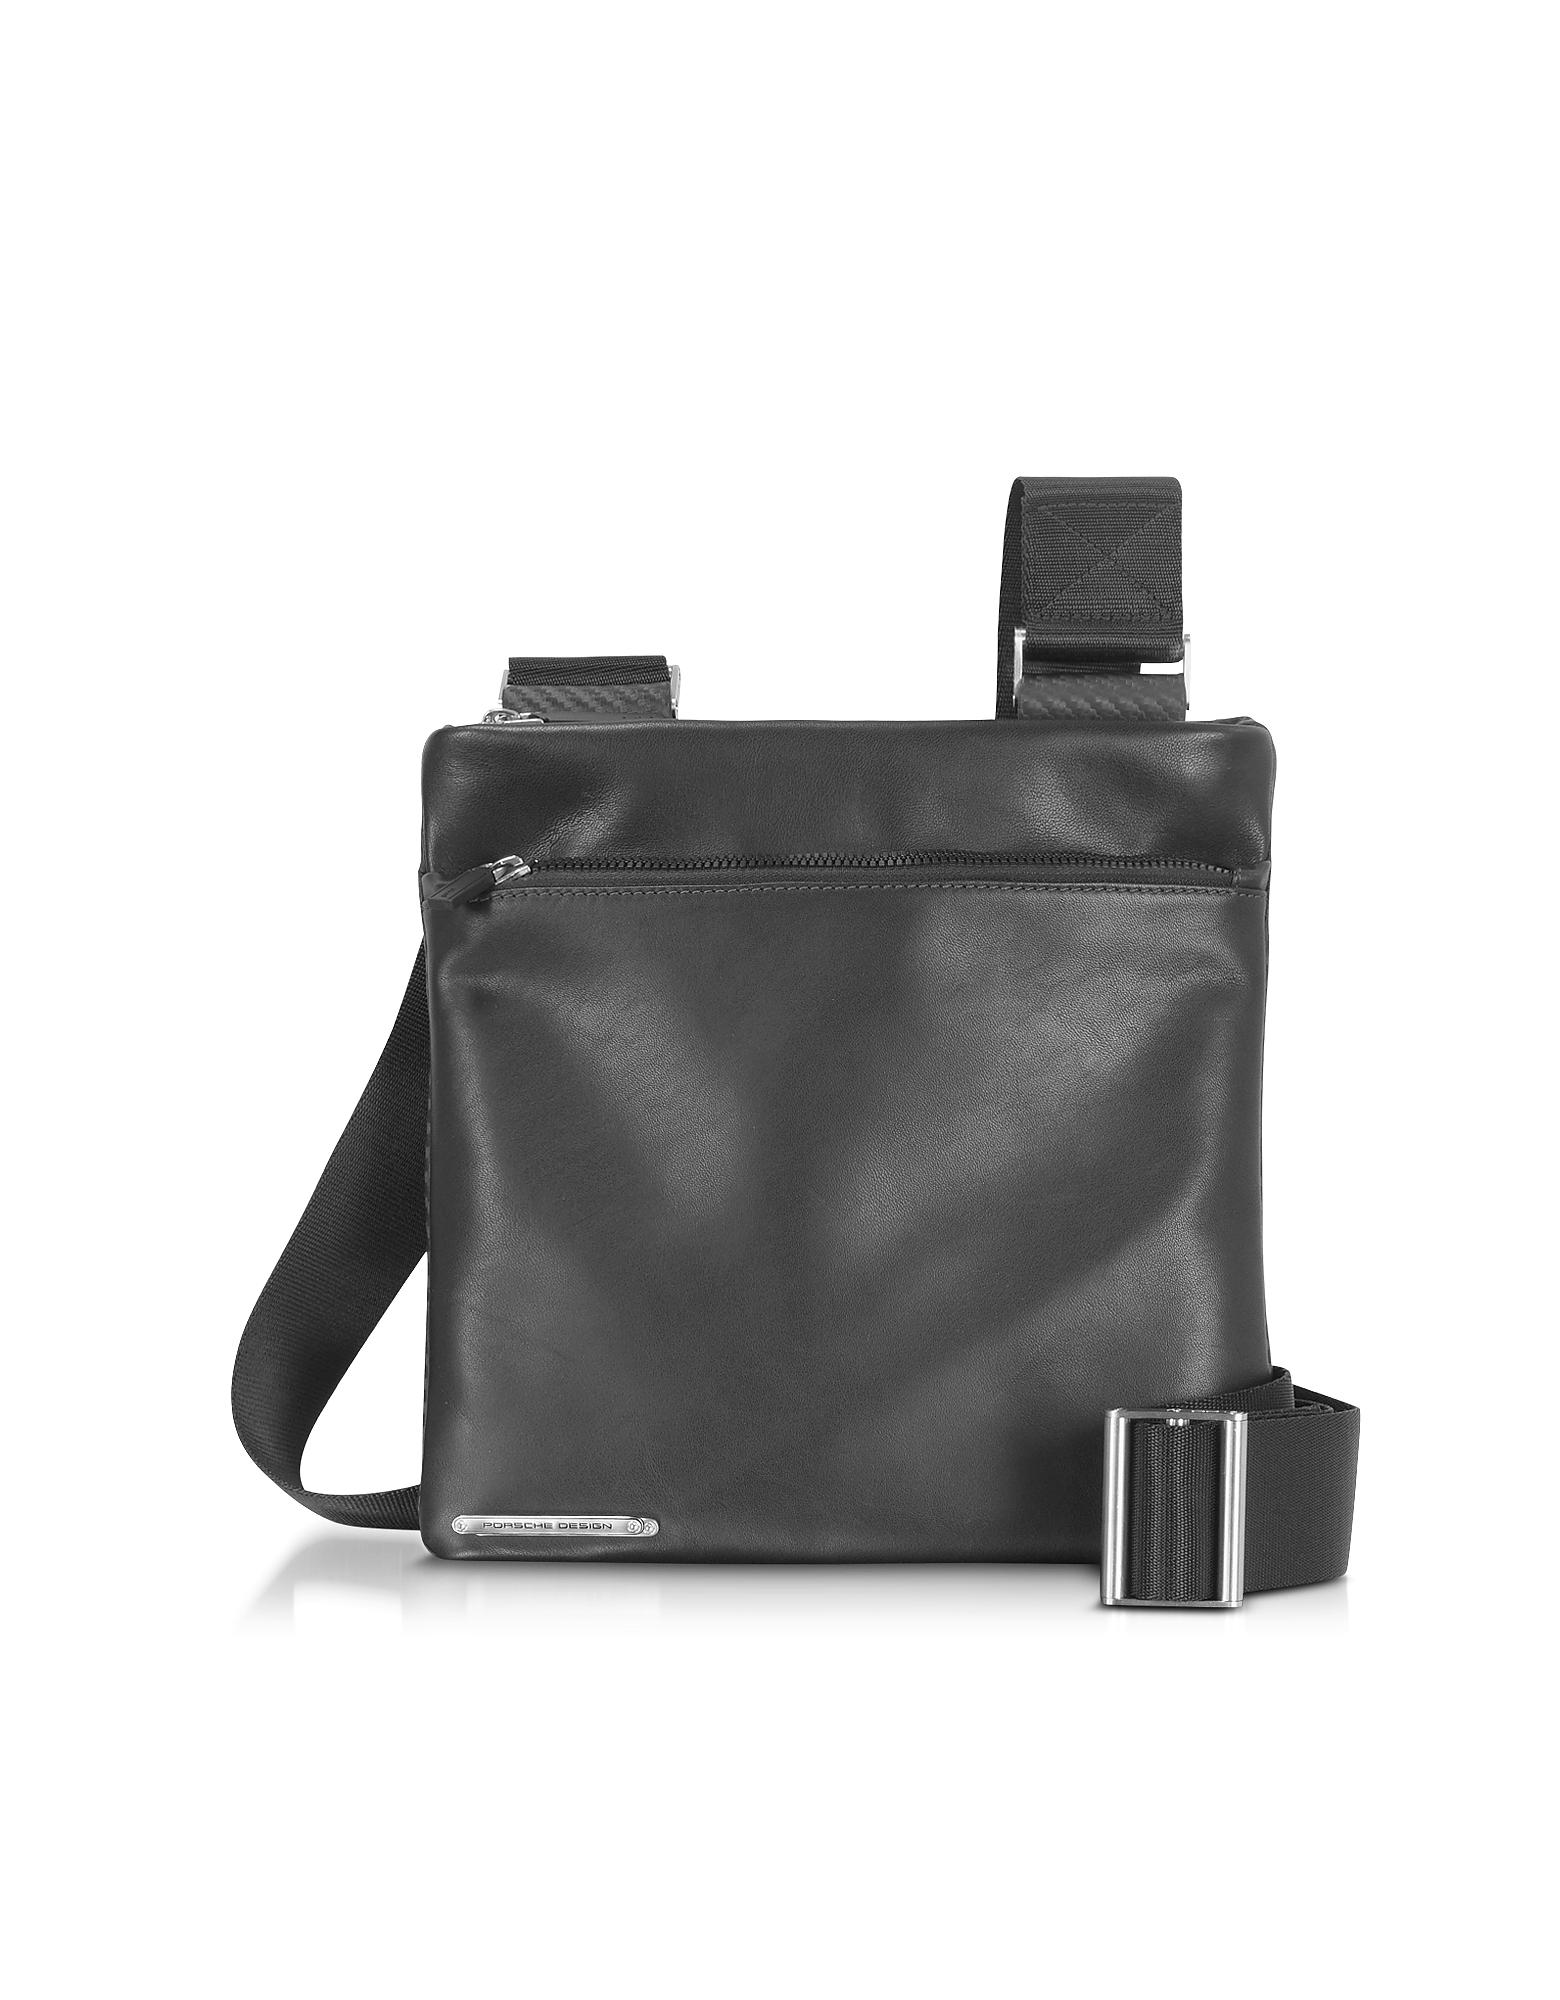 Porsche Design Travel Bags, CL 2.0 - Black Crossbody Bag